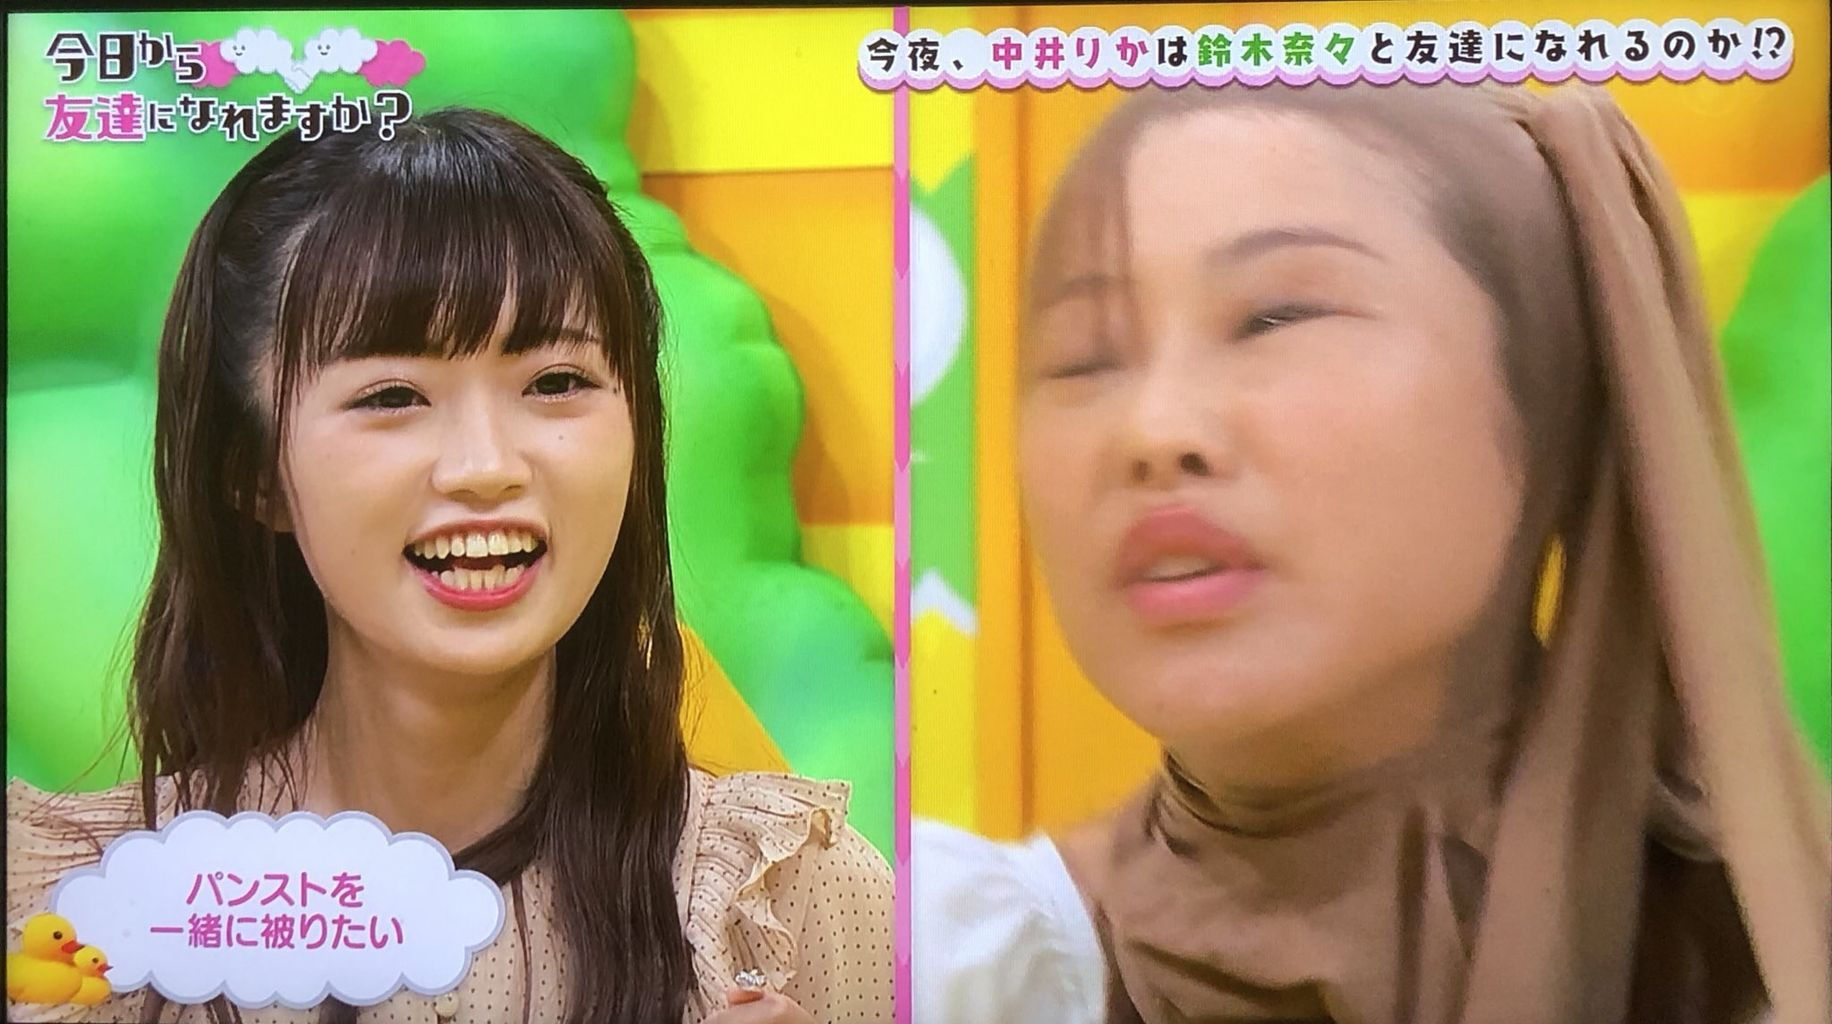 japanese amateur schoolgirls selfshot 1381327 jp.mp4jpg.icu